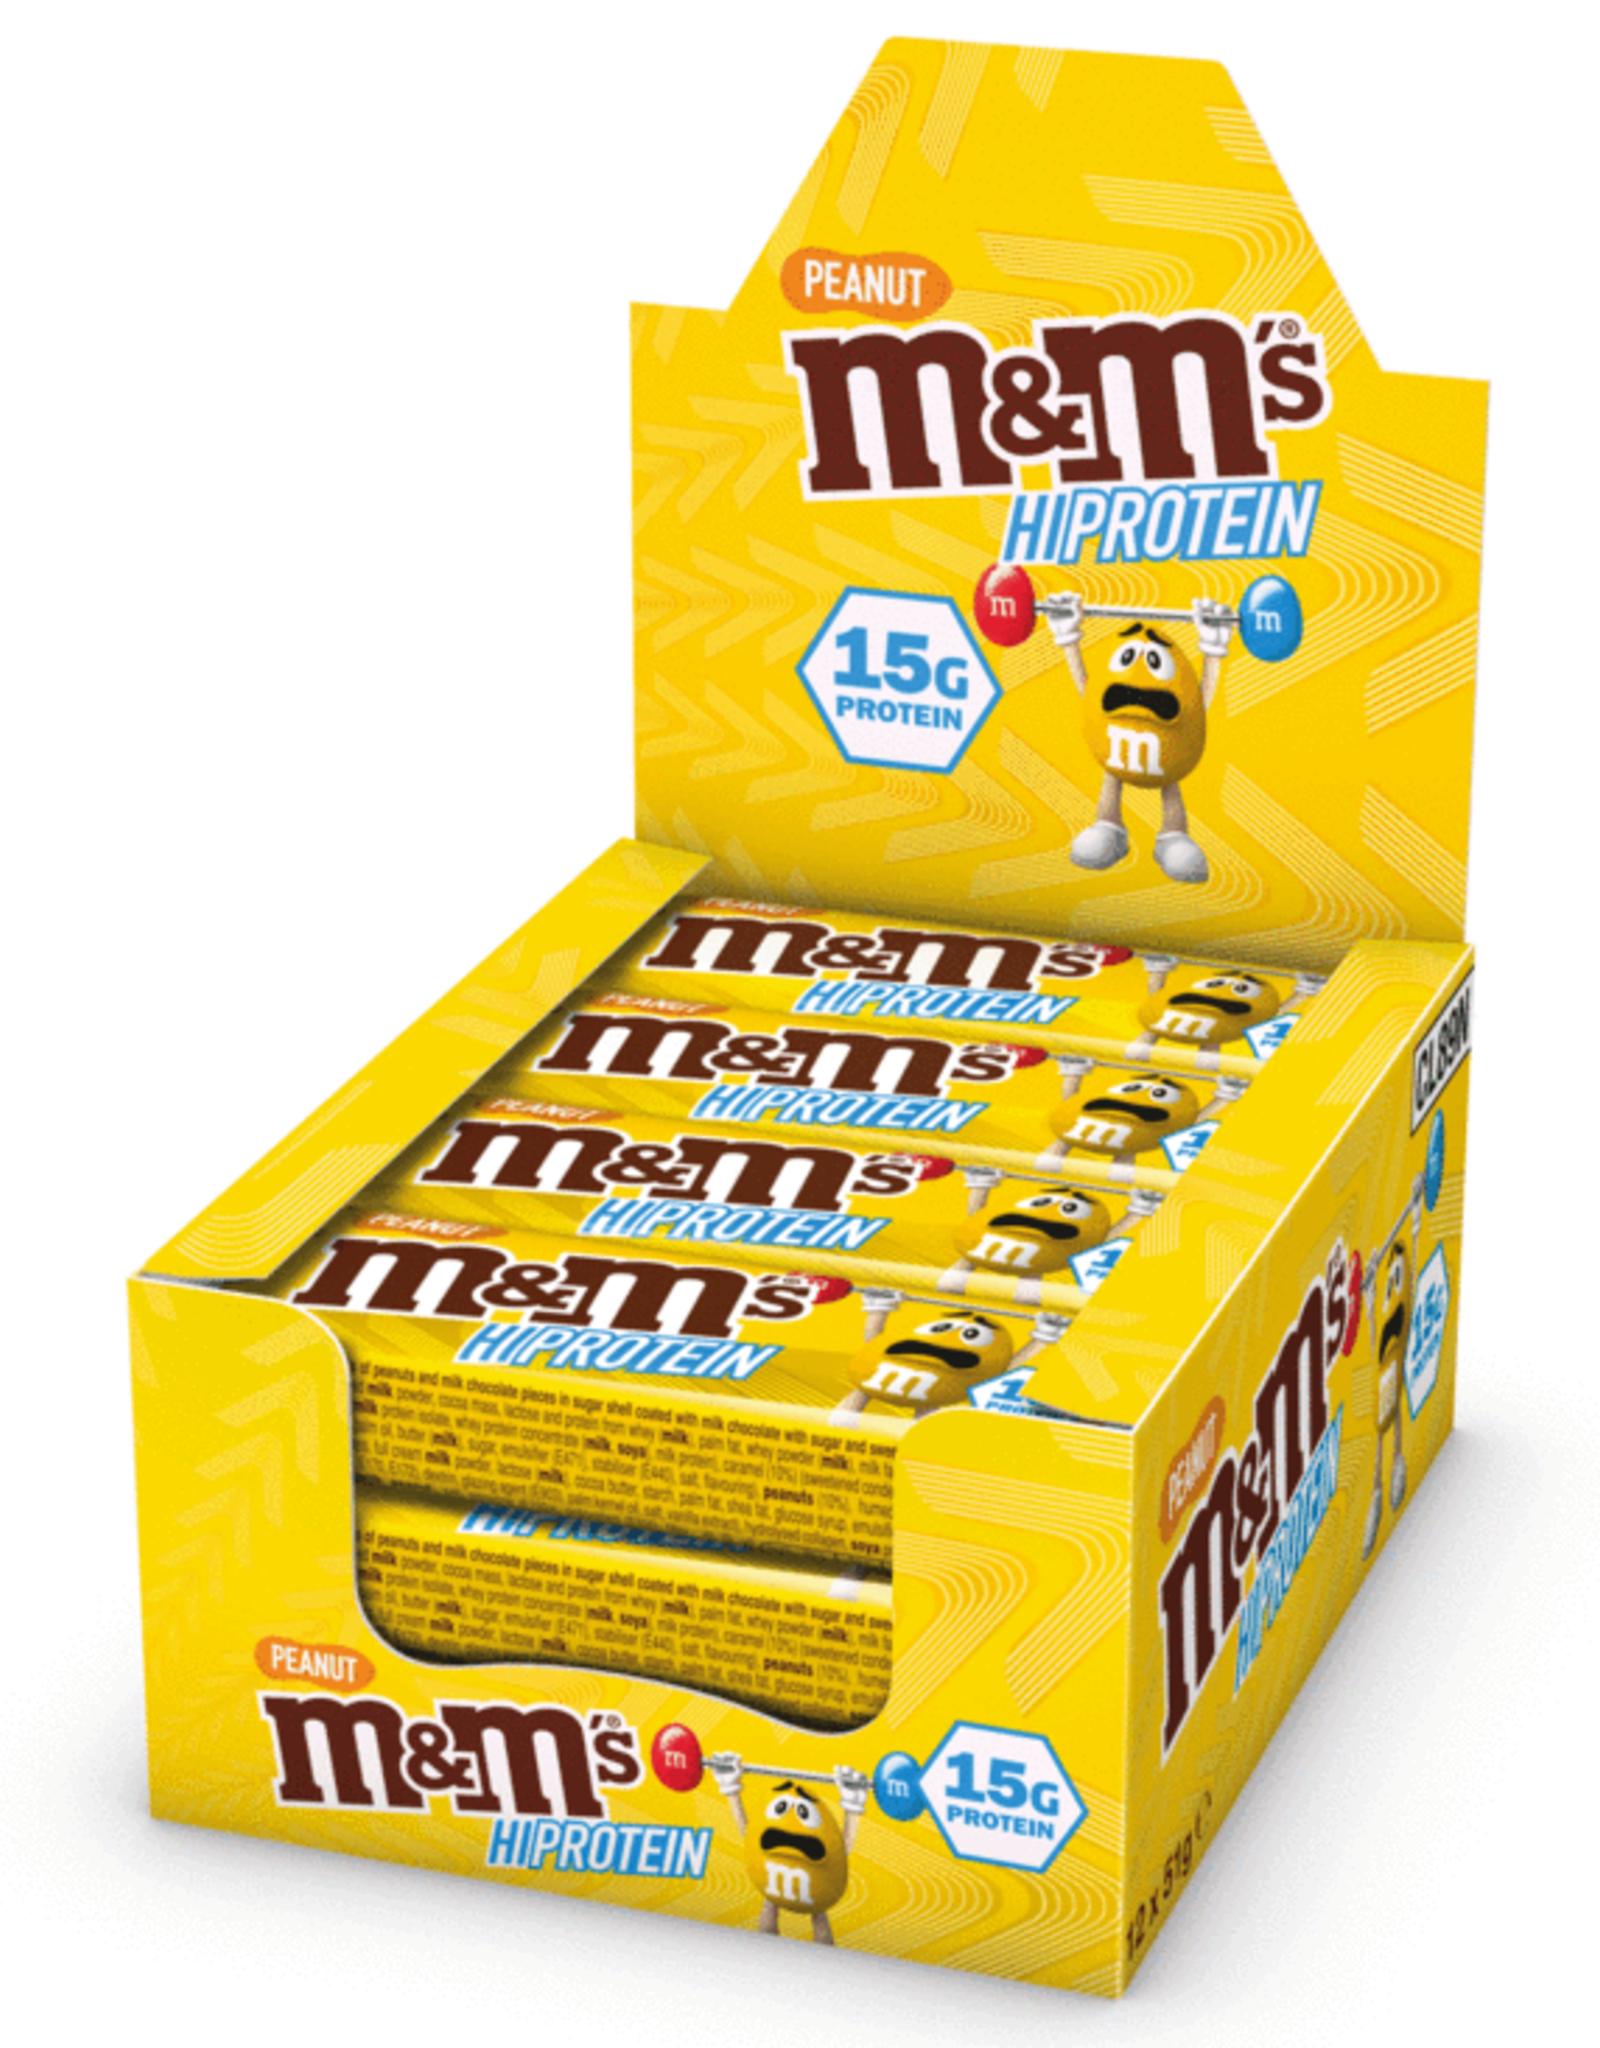 Mars M&M Hi Protein bar